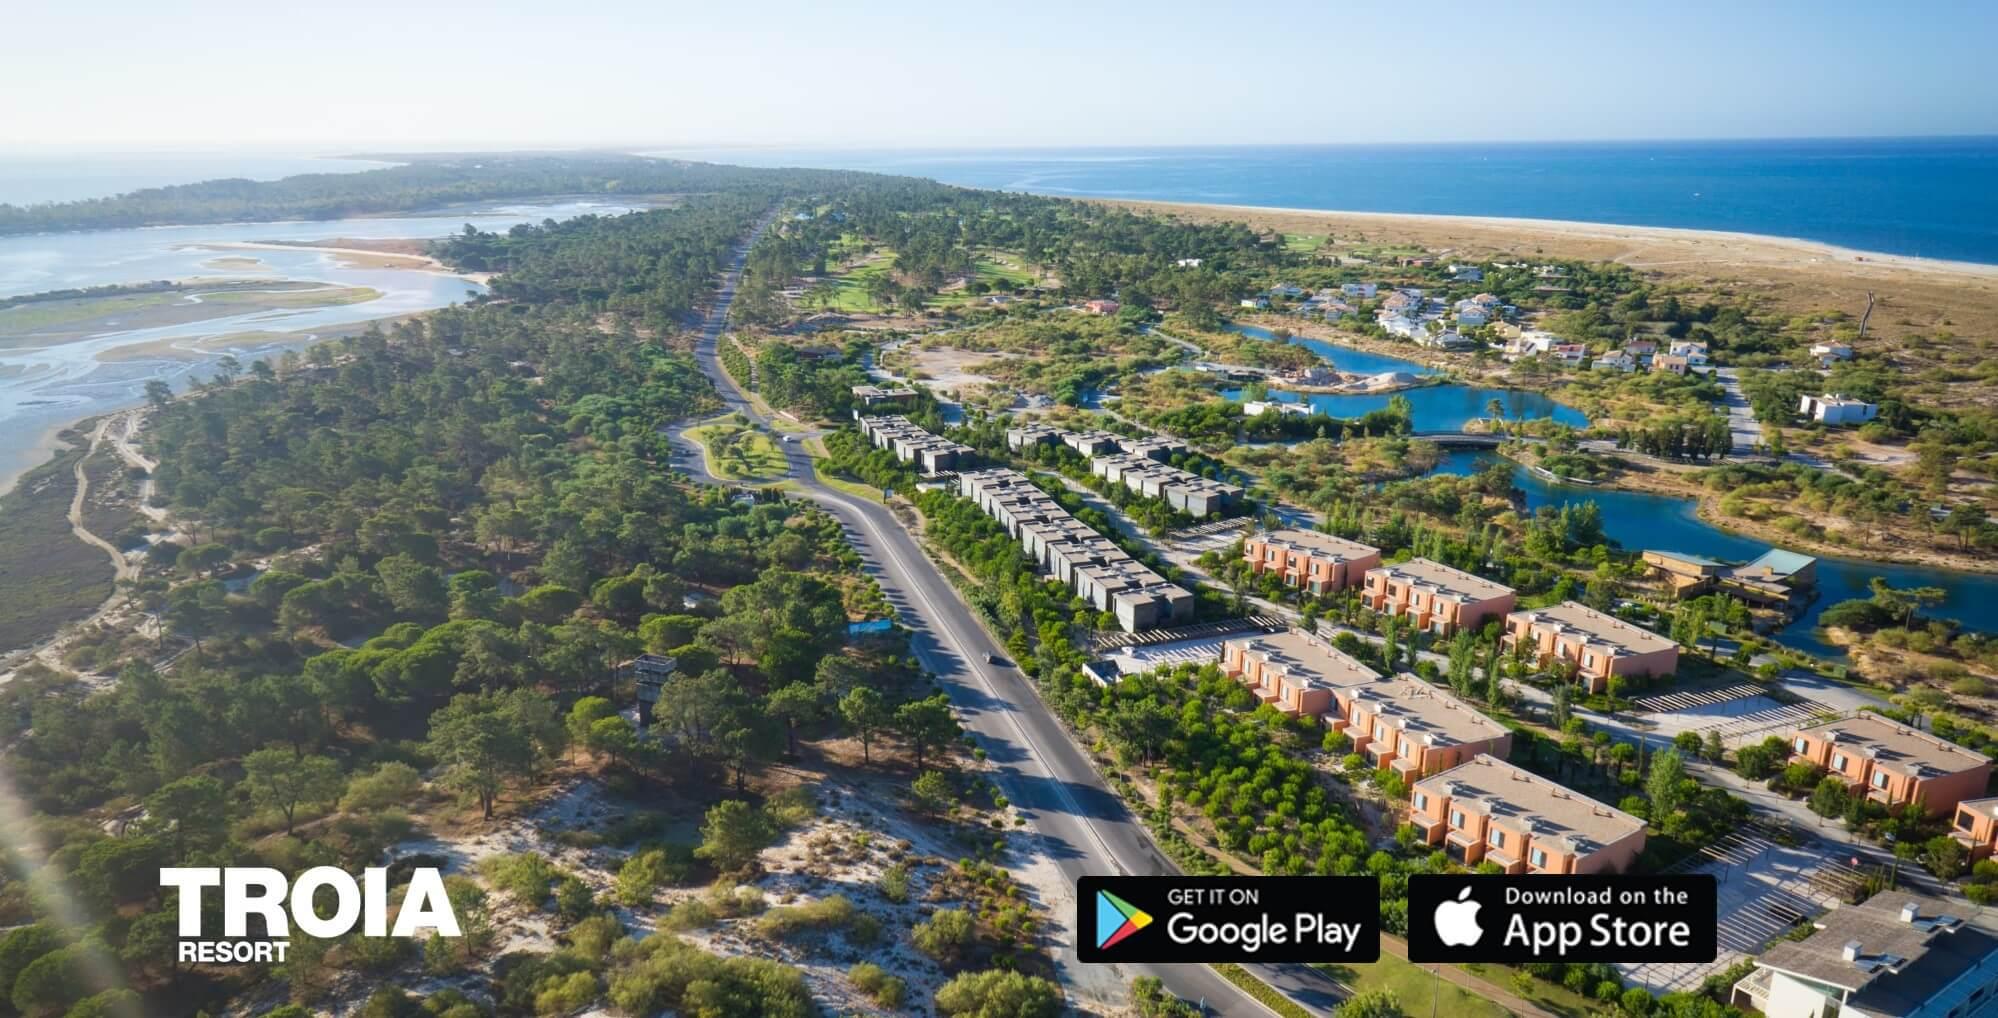 App Troia Resort